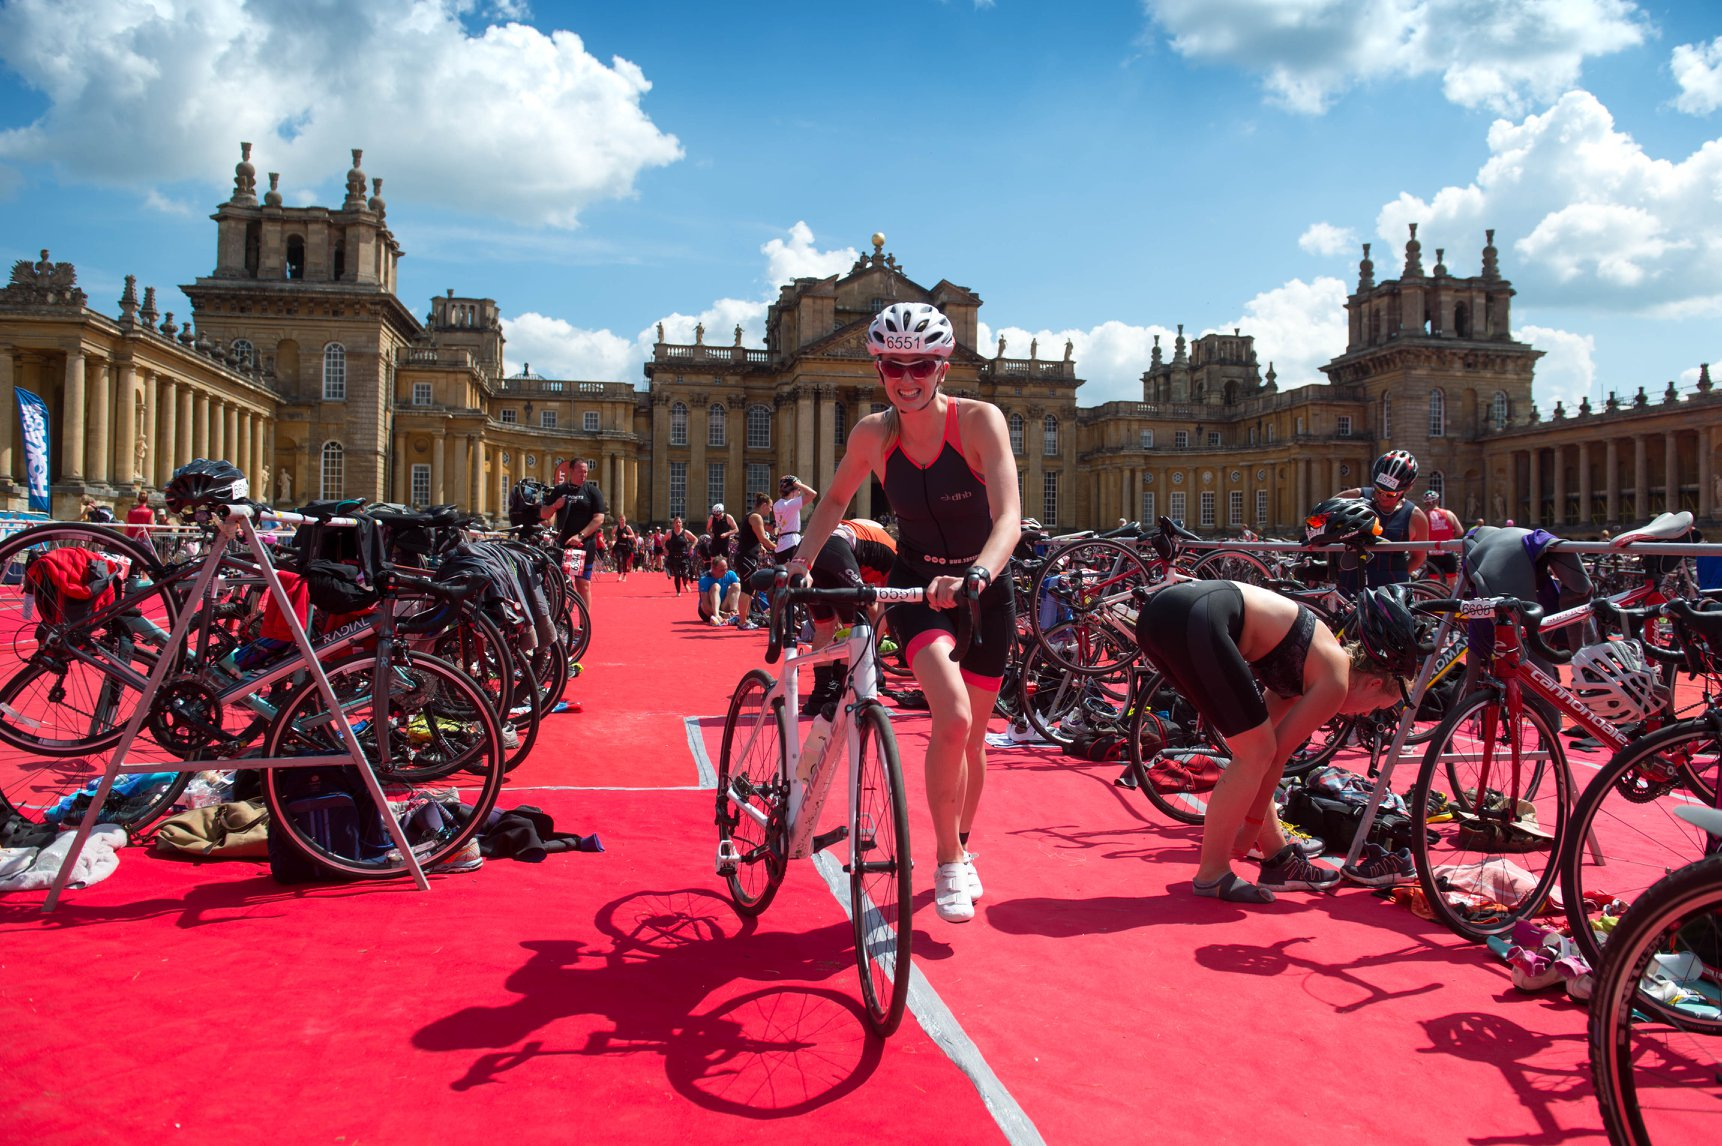 Blenheim Palace Triathlon - image 2